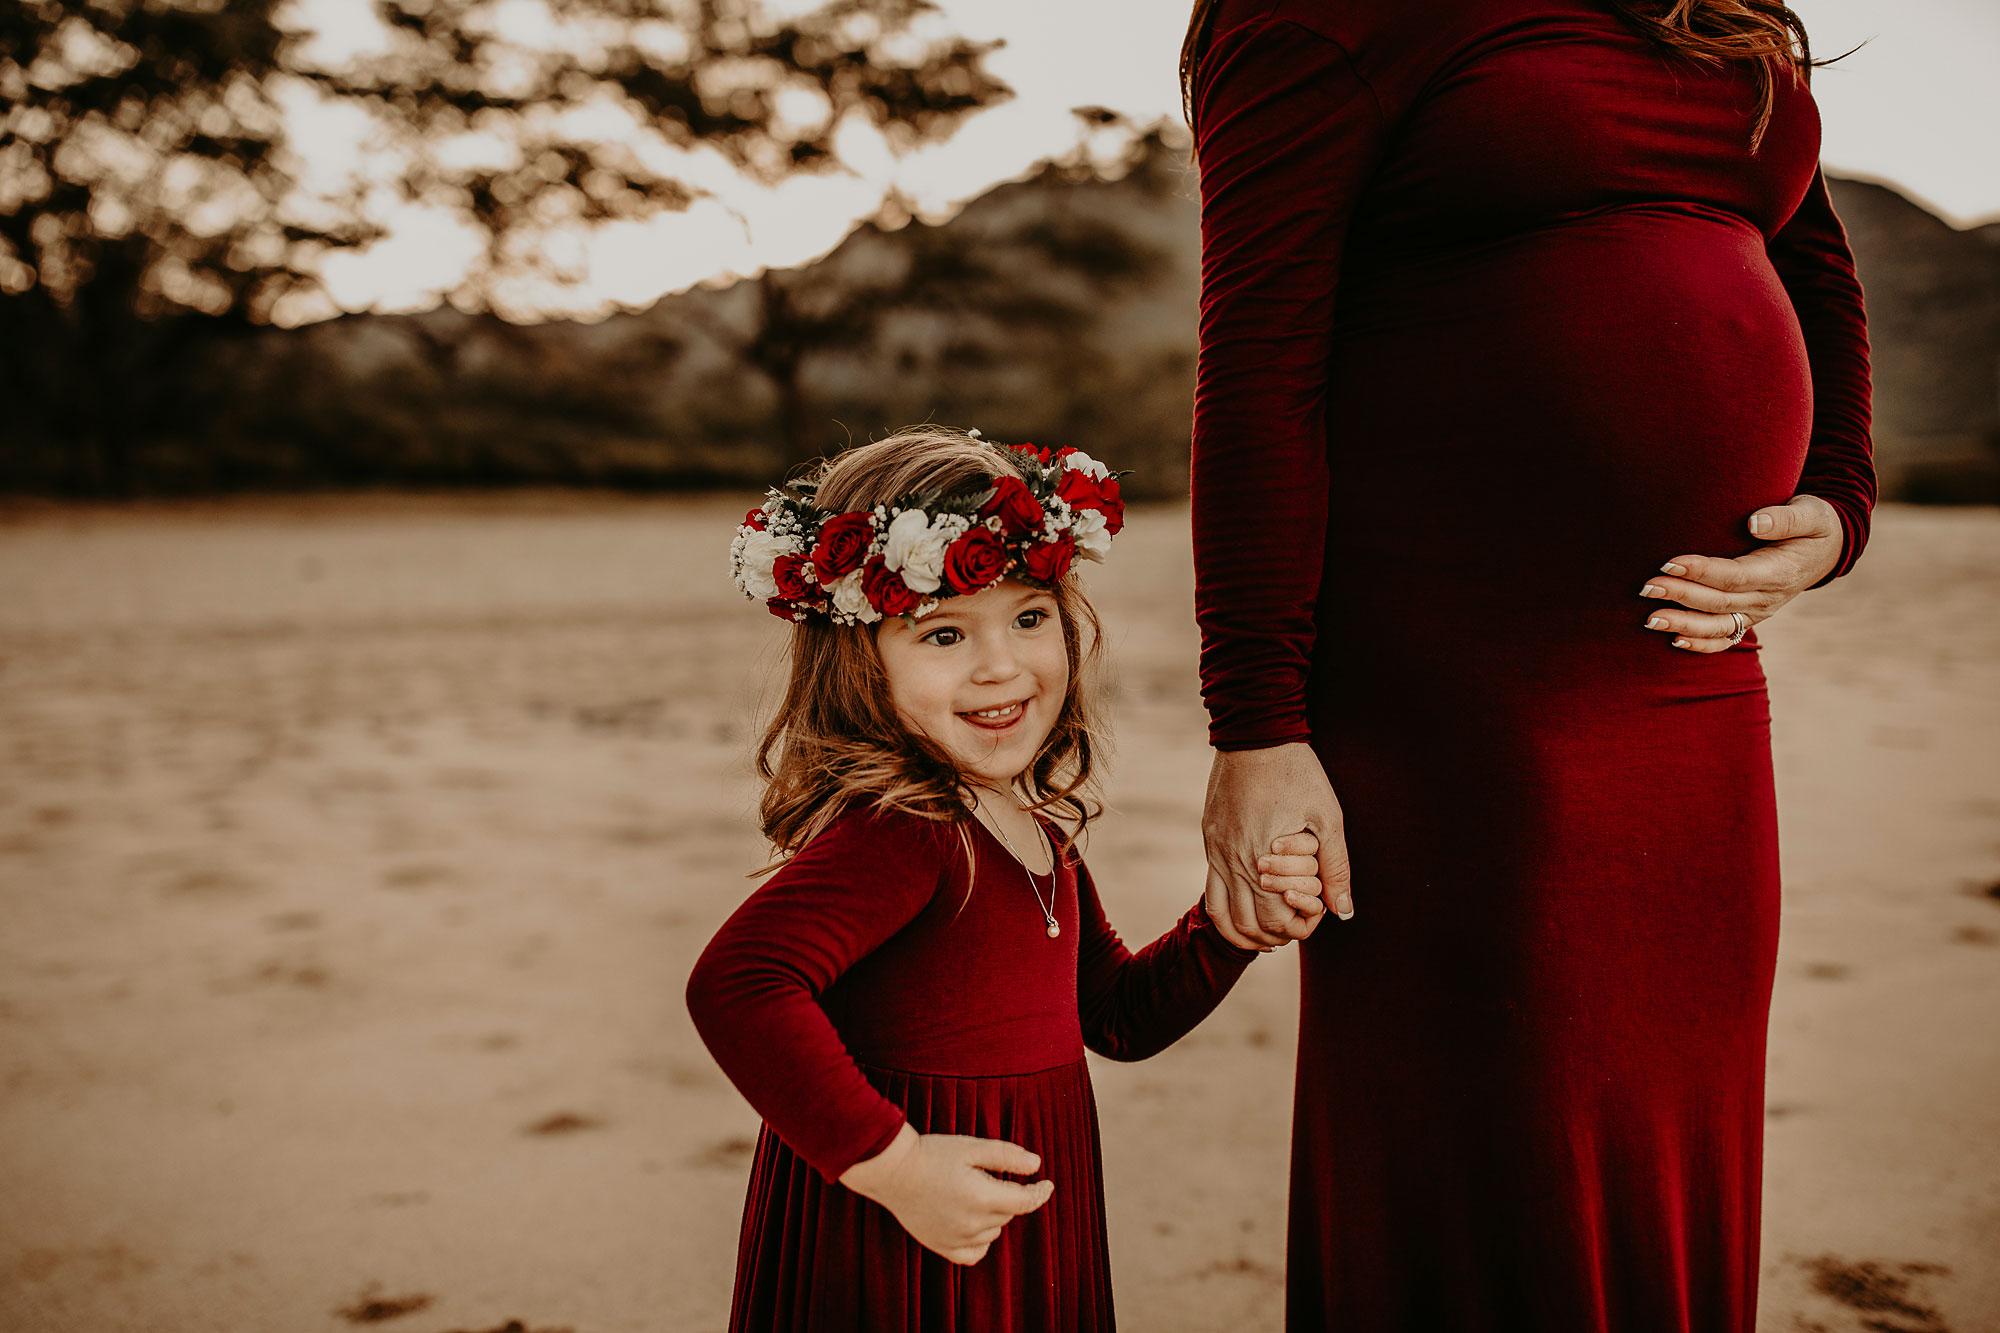 oahu-maternity-photographer-04.jpg